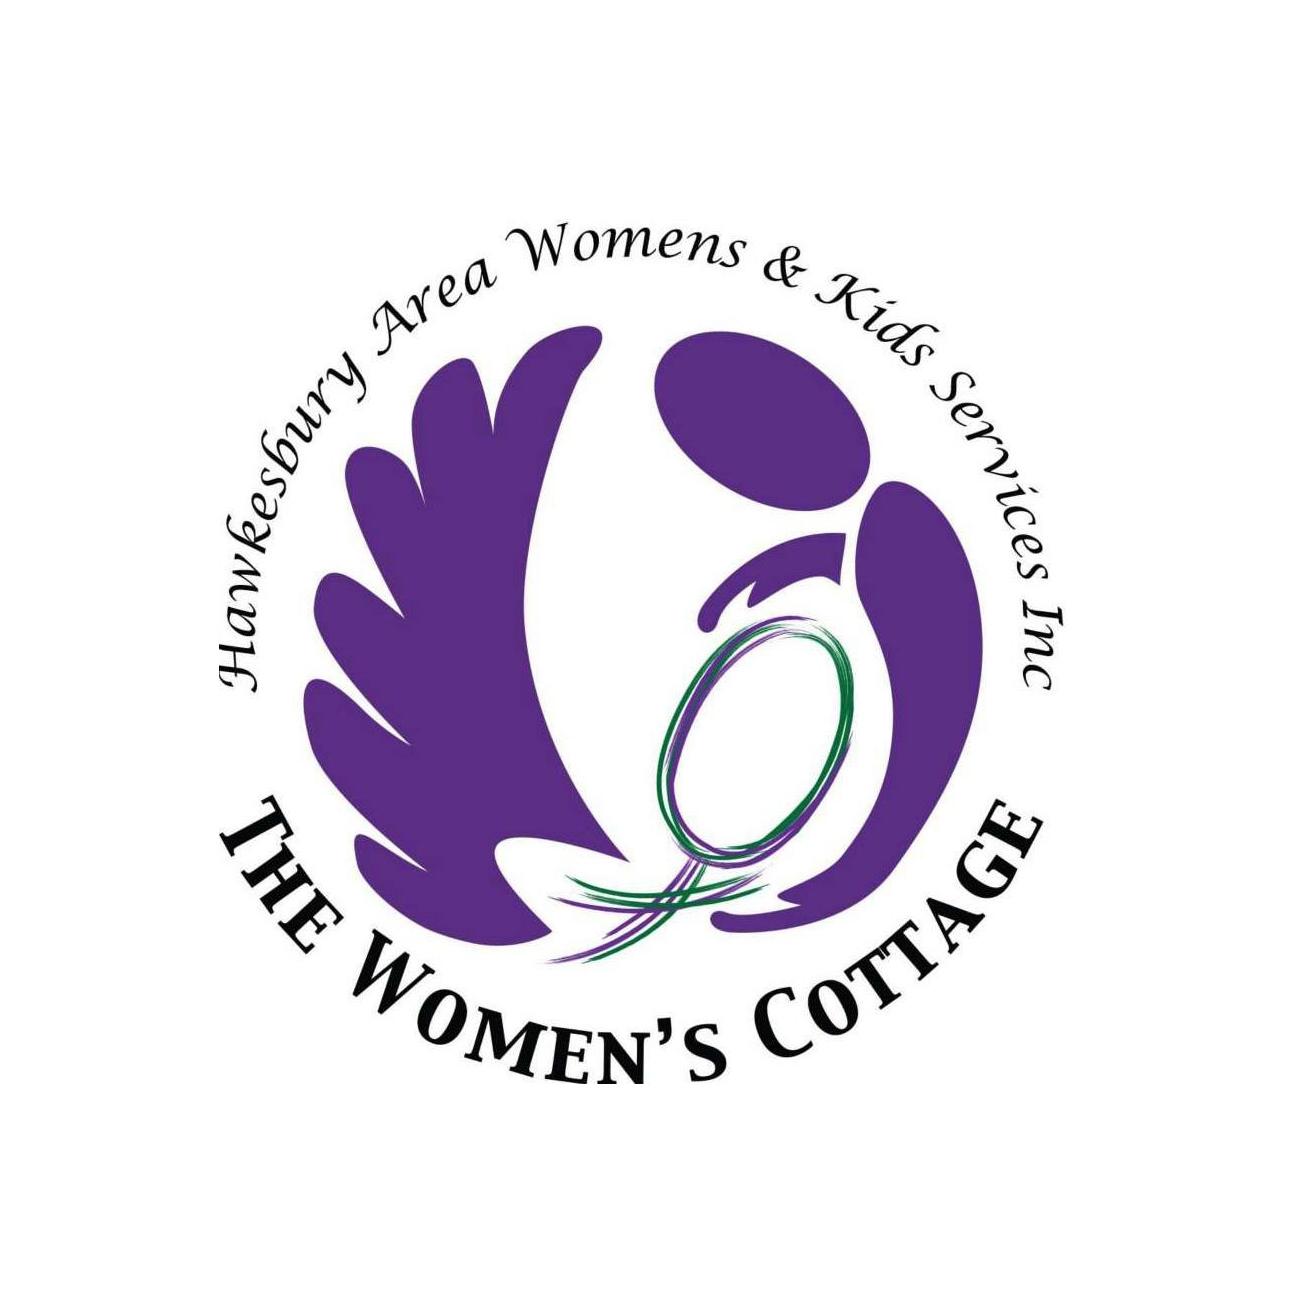 Womens Cottage logo.jpg